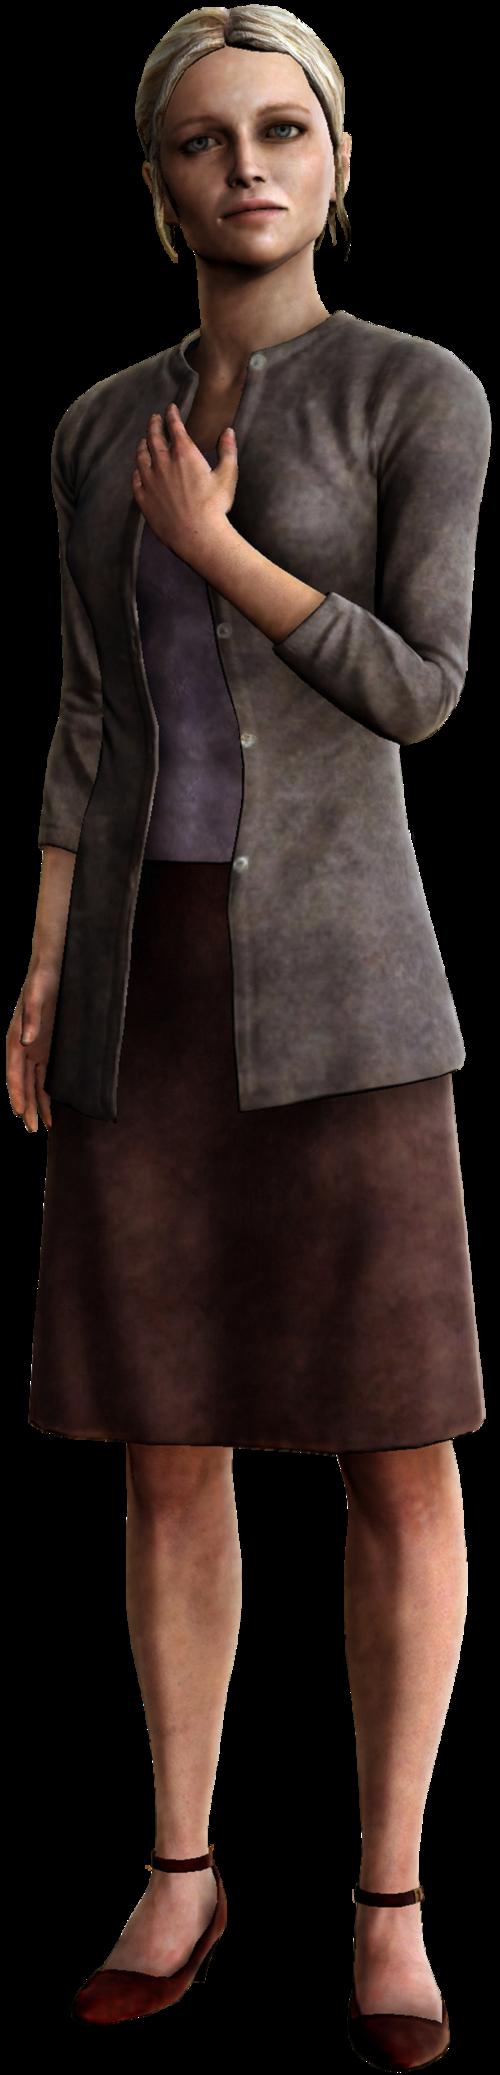 Judge Margaret Holloway